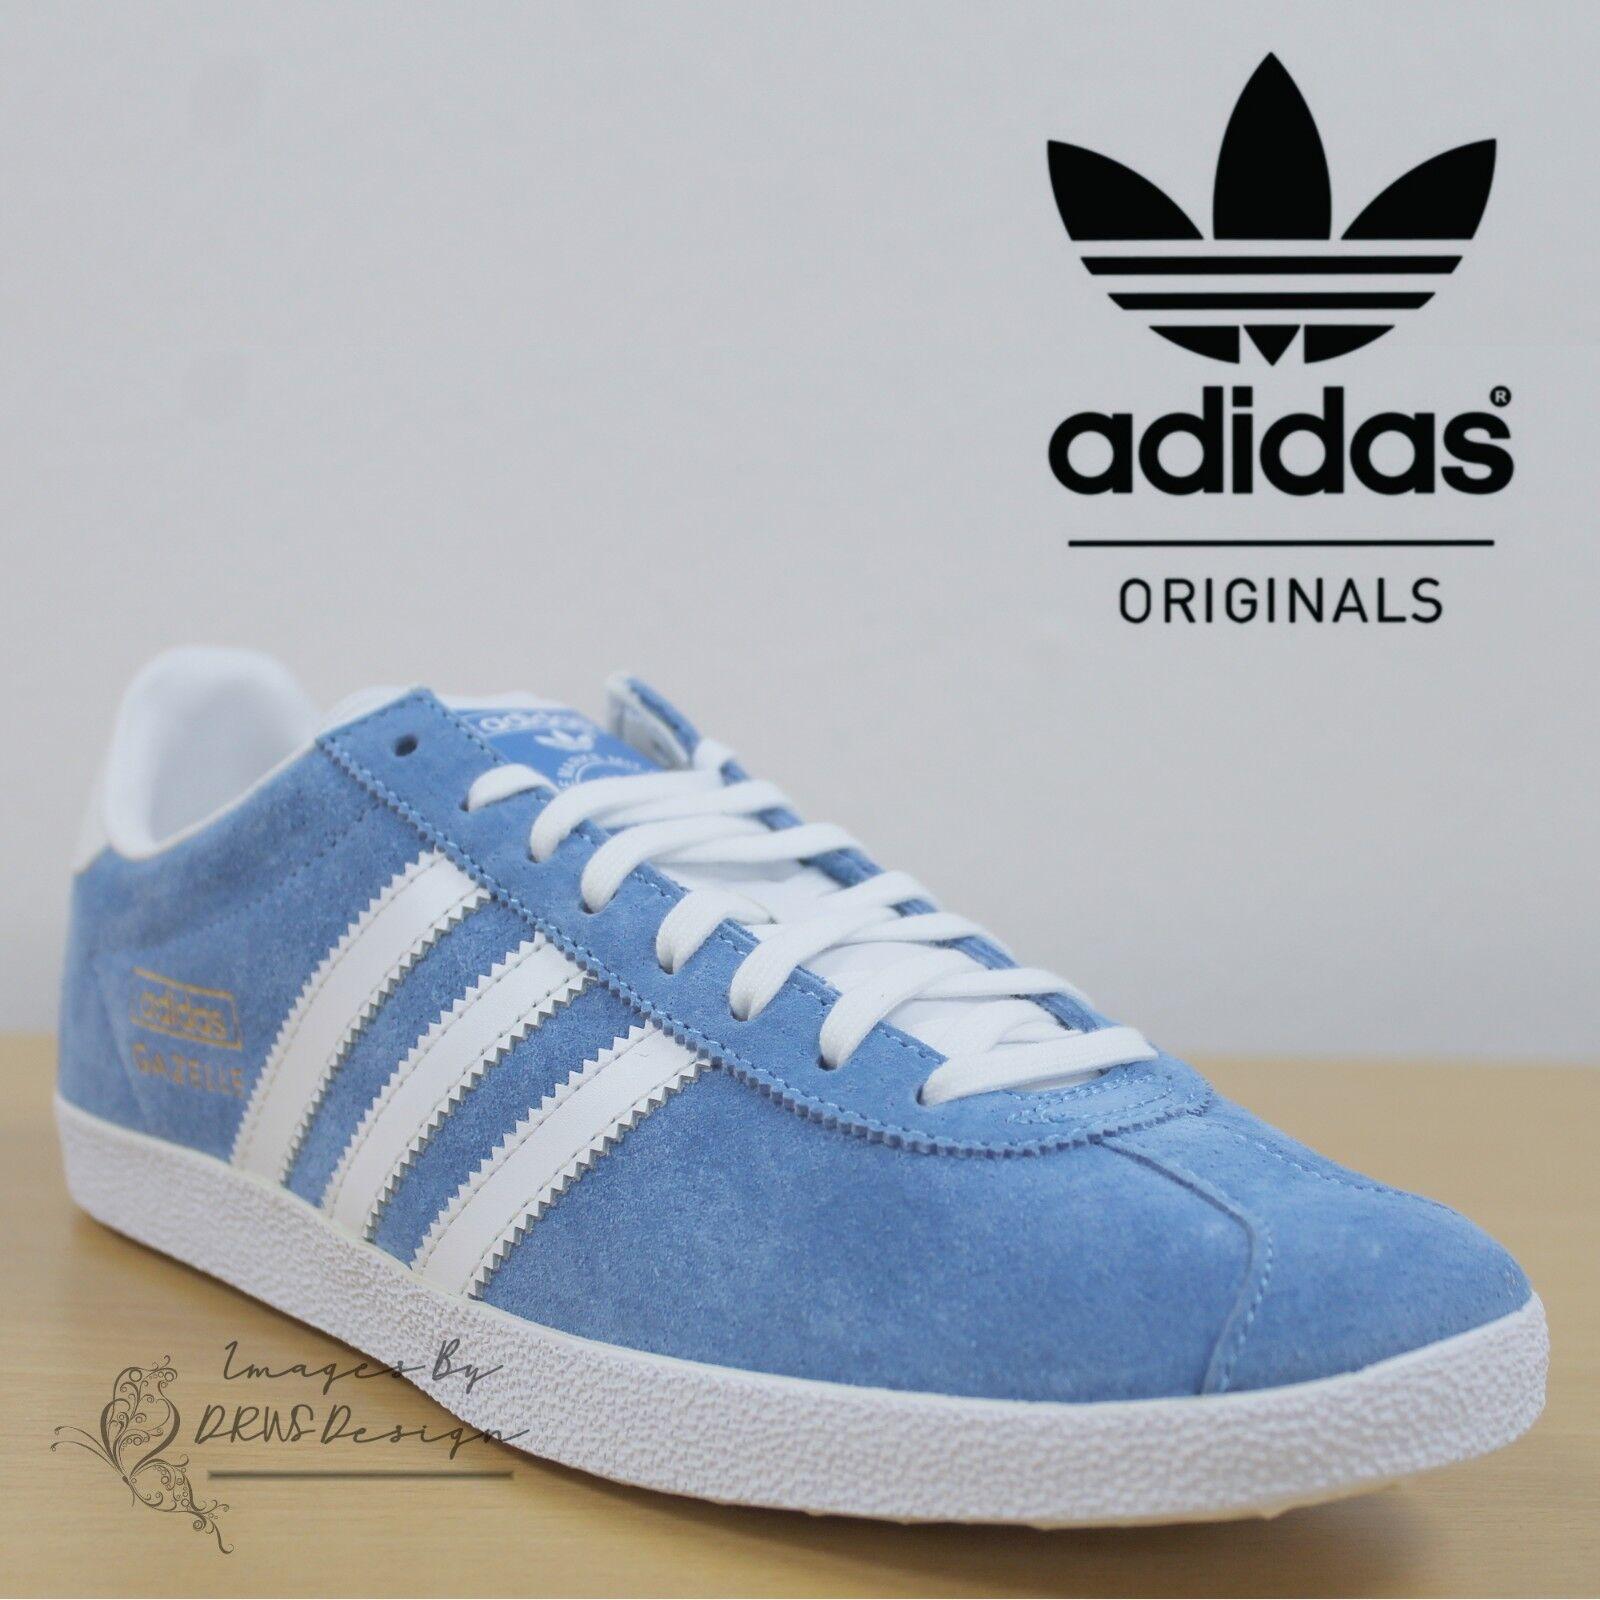 Adidas Originals Gazelle OG Men's bluee Trefoil Trefoil Trefoil Trainers Casual Retro Sneakers 8cbd27